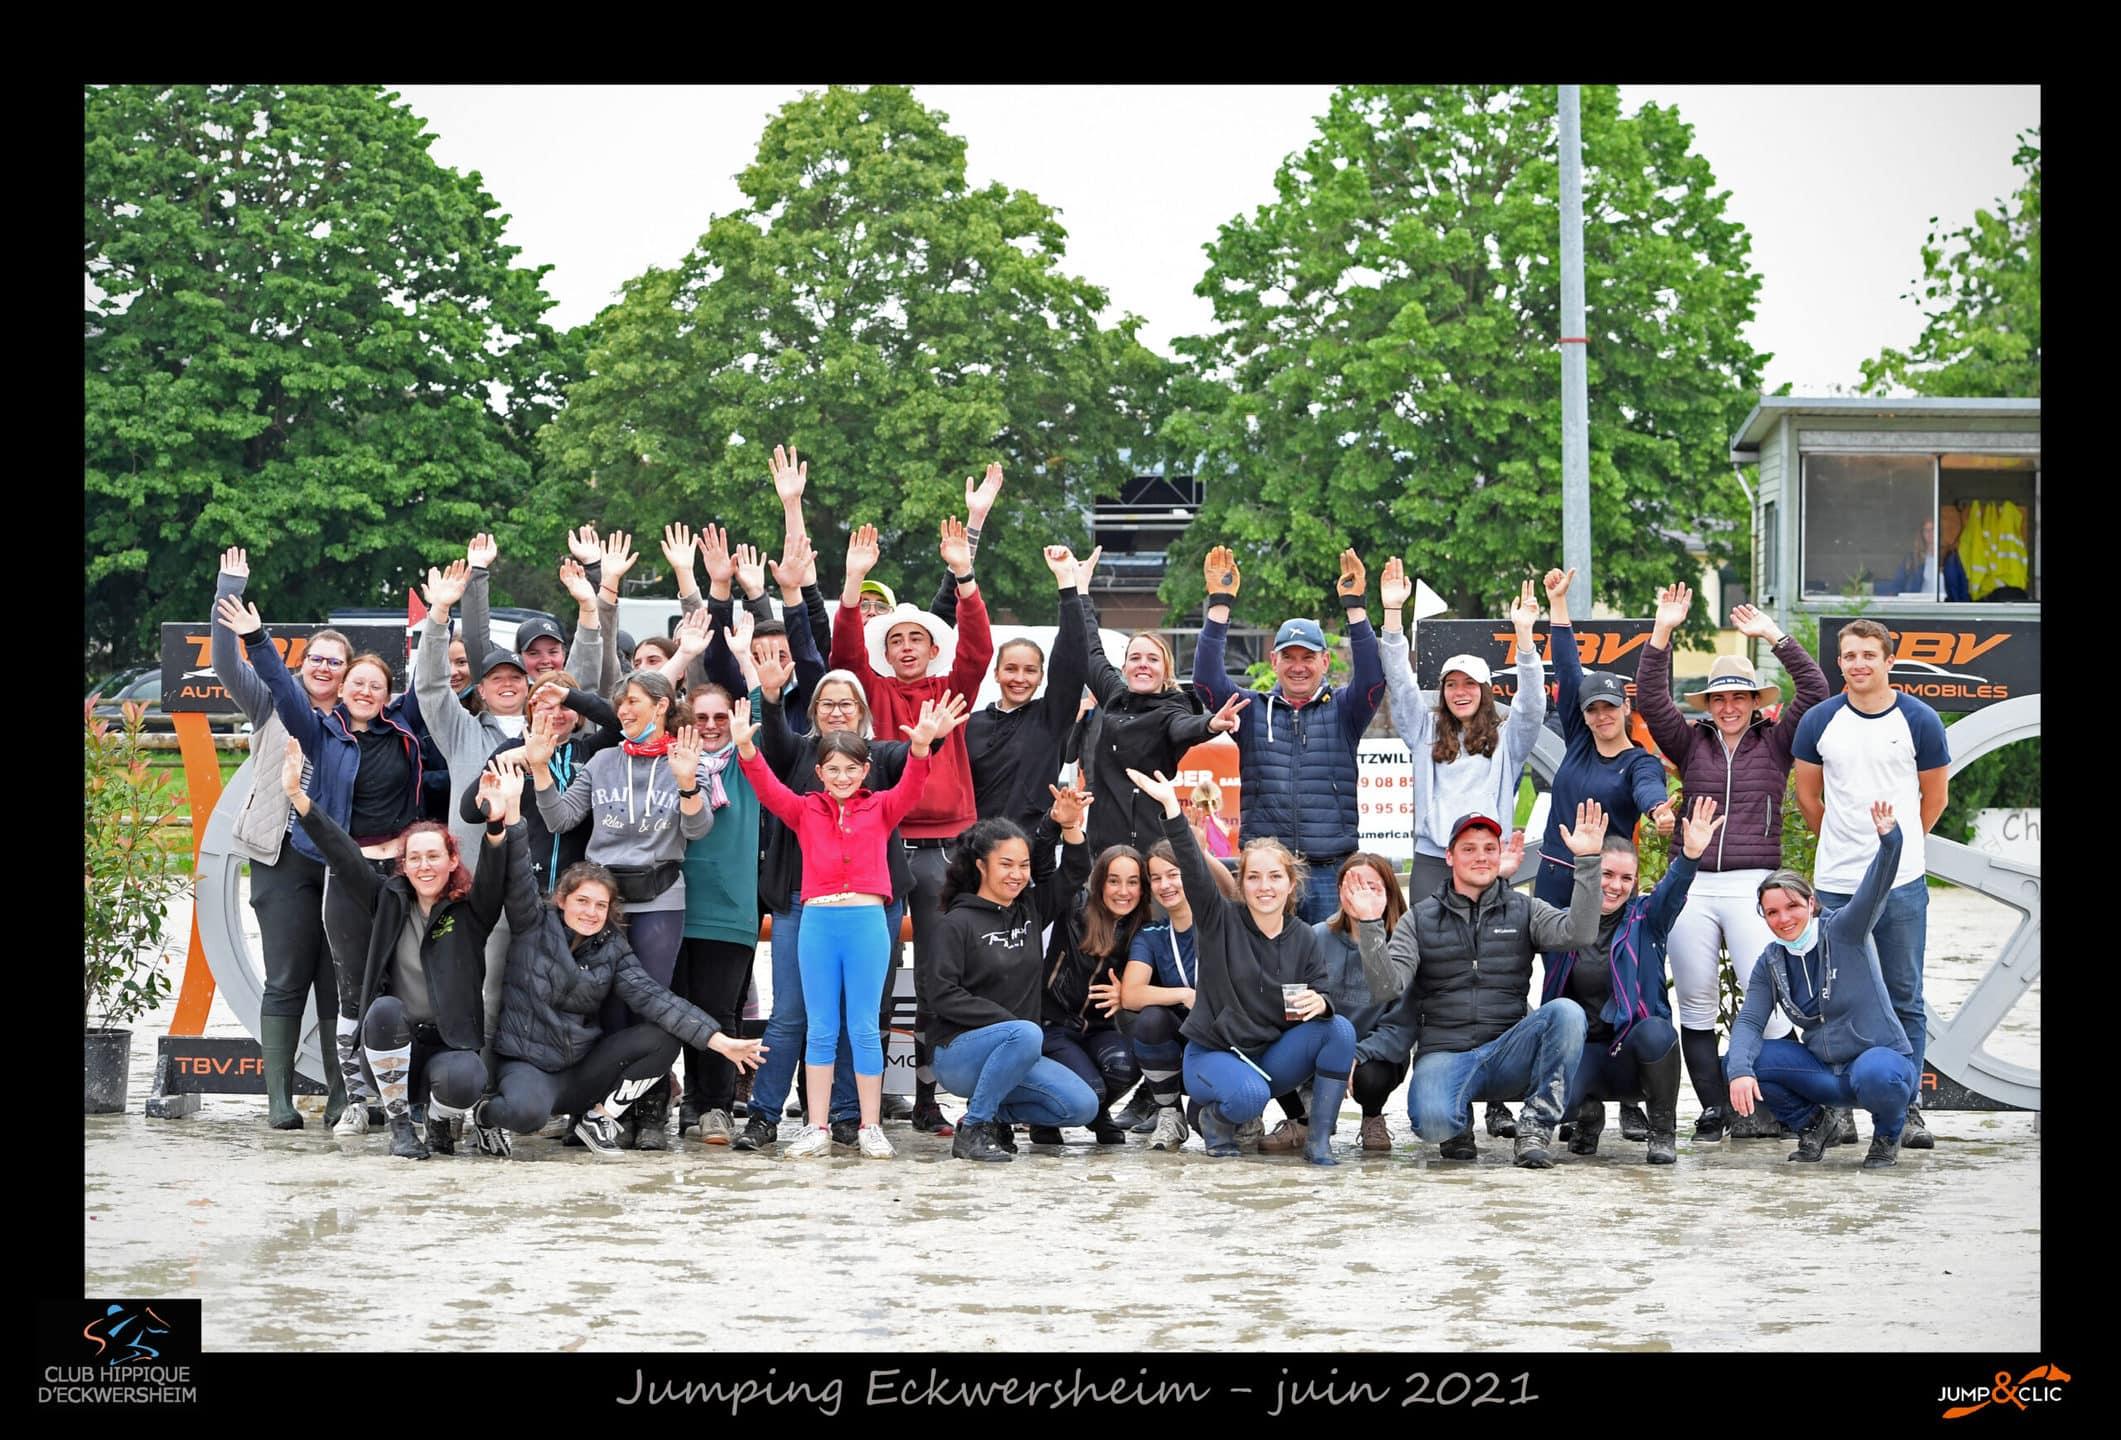 Photo d'équipe des bénévoles au Club Hippique Eckwersheim